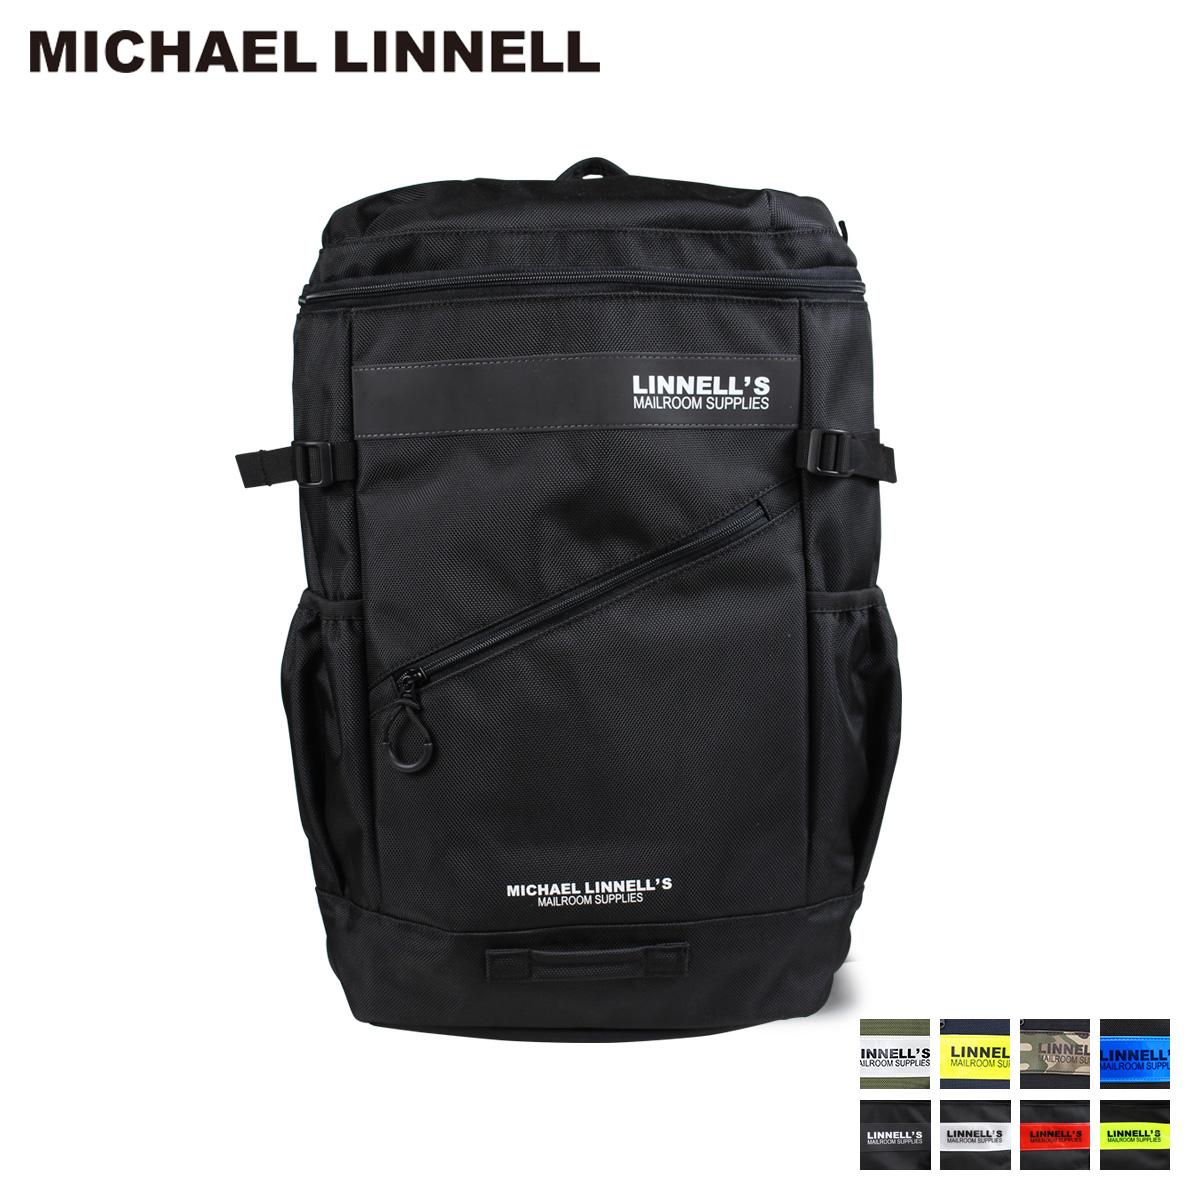 MICHAEL LINNELL BOX BACKPACK マイケルリンネル リュック バッグ 32L メンズ レディース バックパック ブラック ネイビー カーキ 黒 ML-020